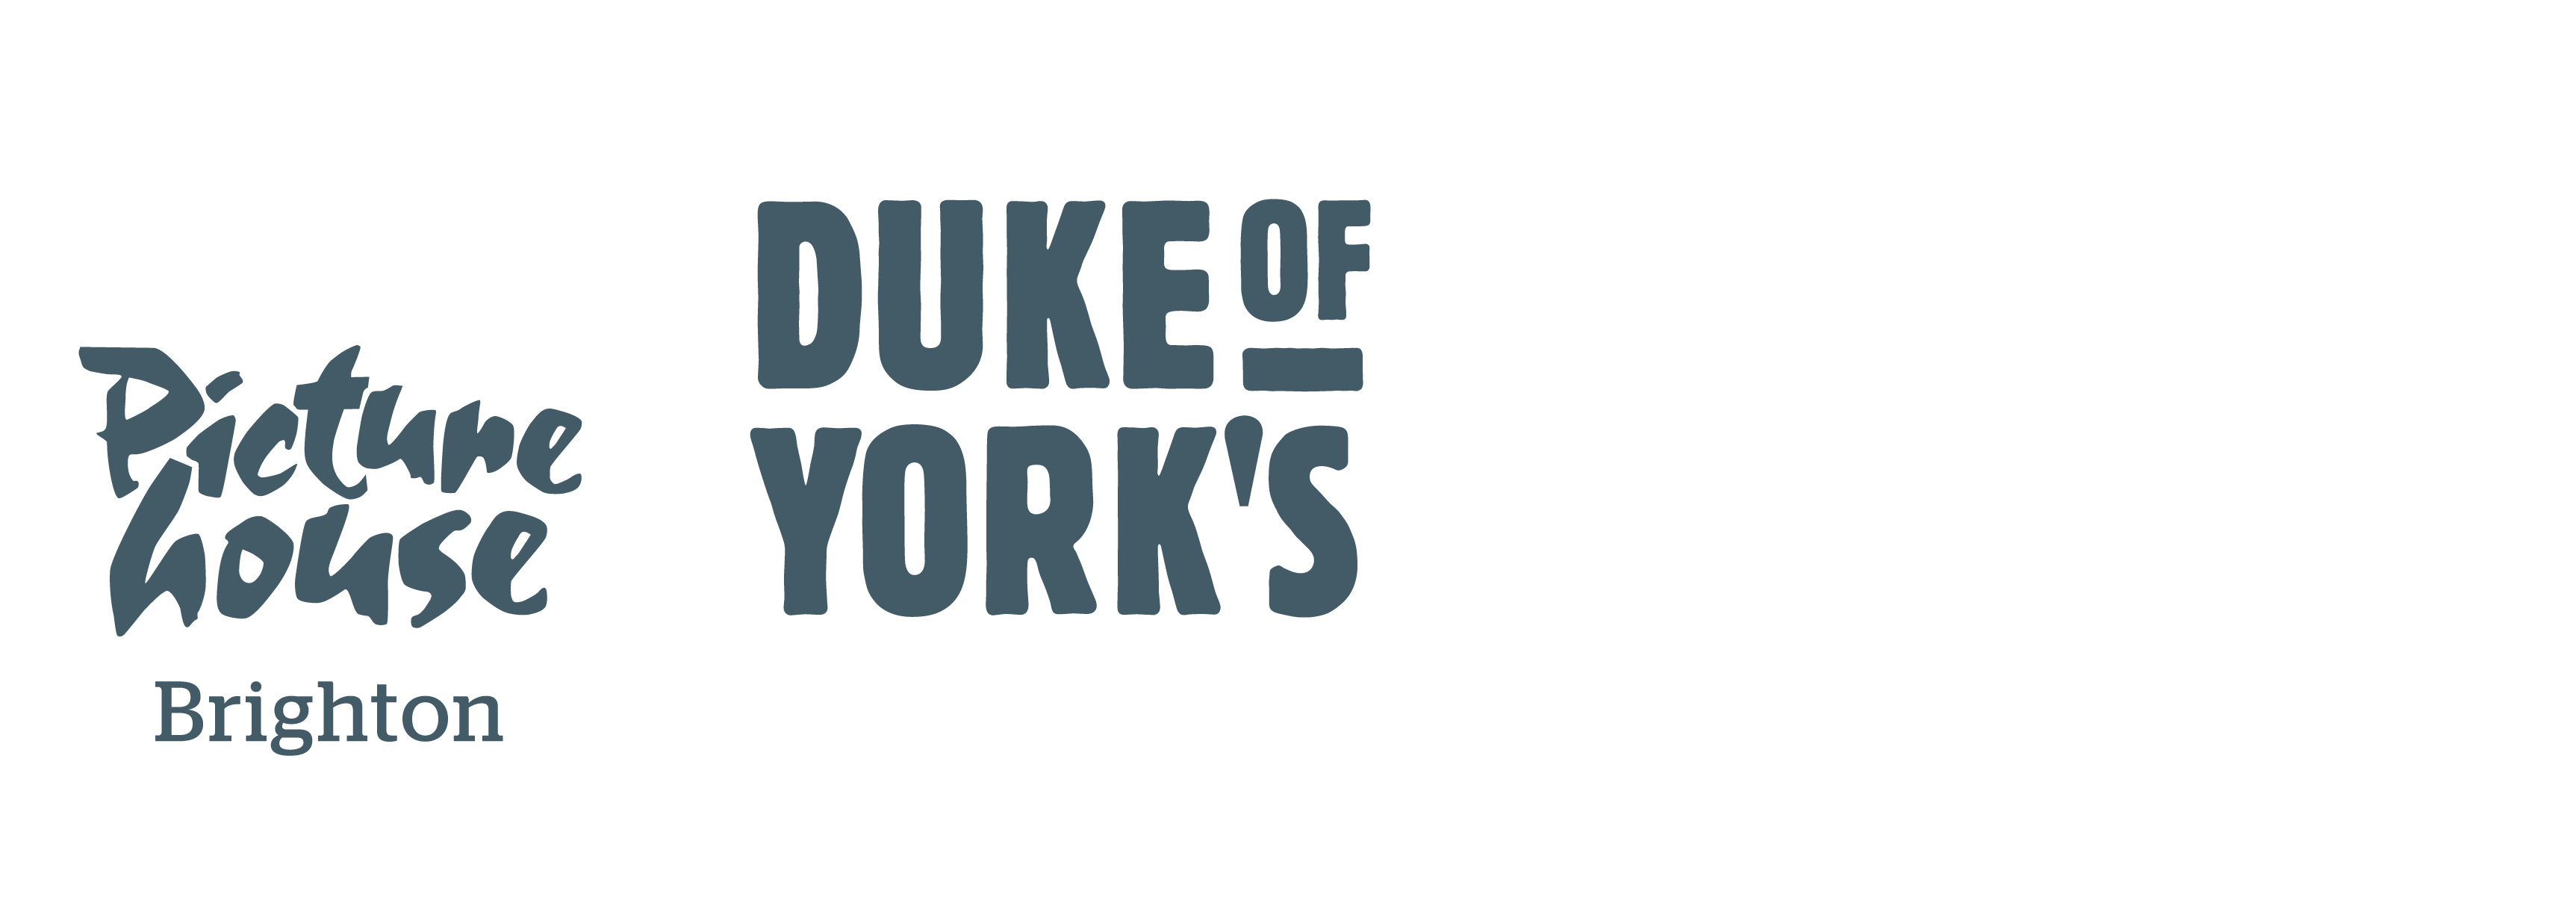 Duke of Yorks Brighton Blue Logo RGB